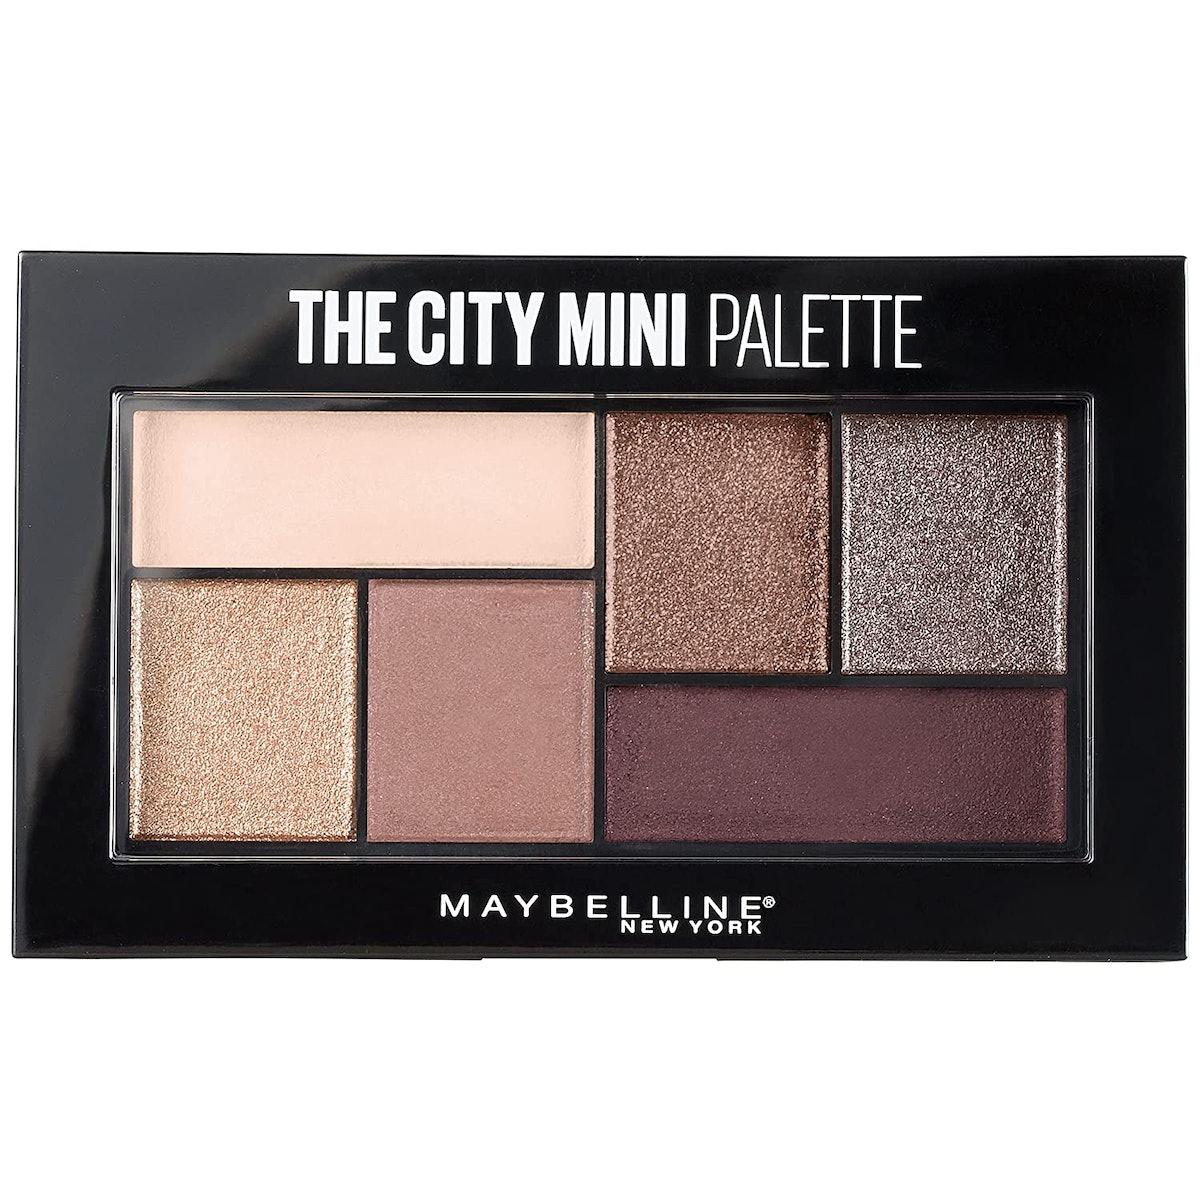 Maybelline The City Mini Eyeshadow Palette in Chill Brunch Neutrals